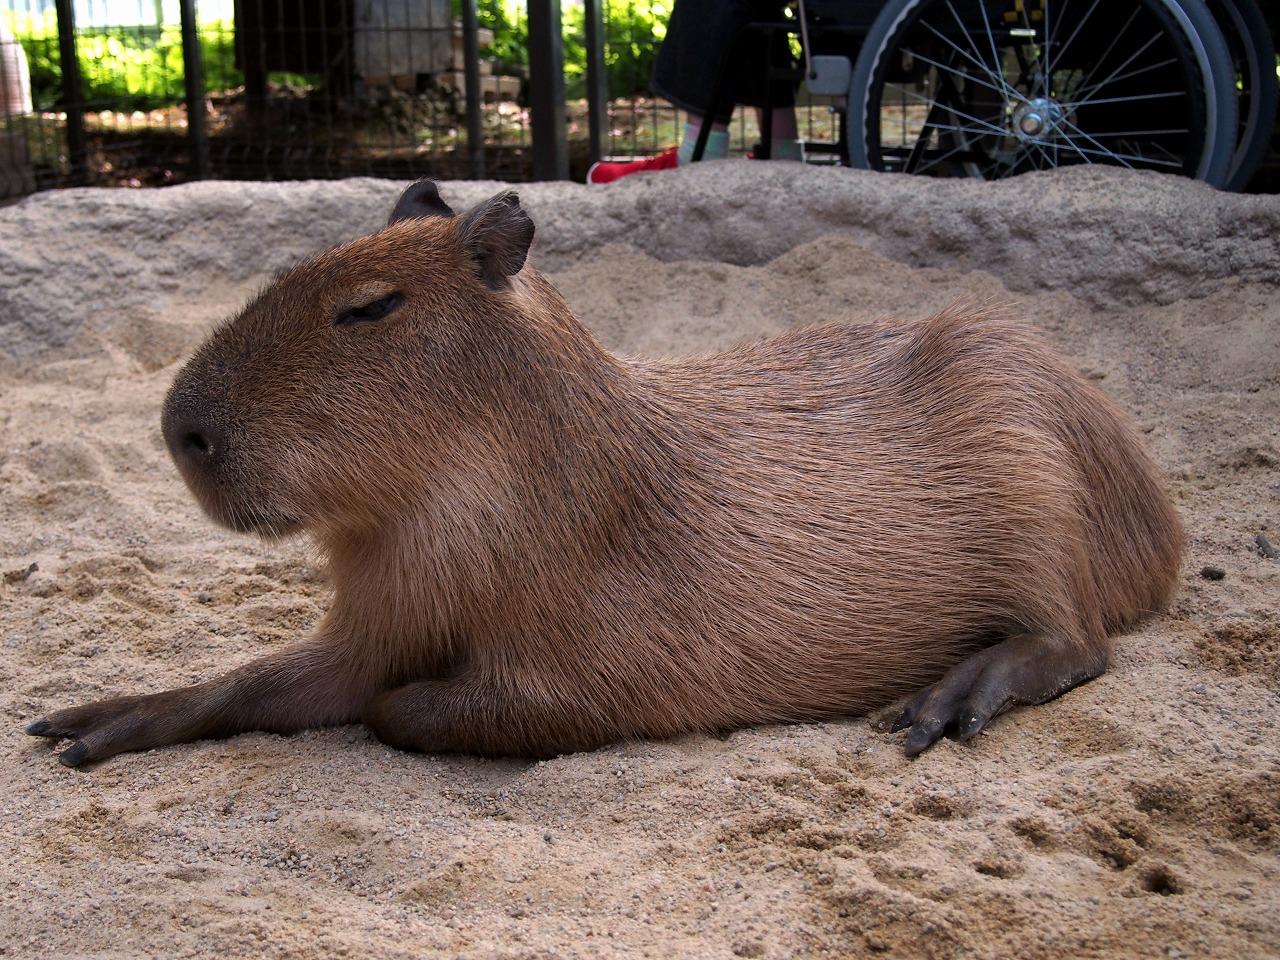 Capybara_20140913-01.jpg